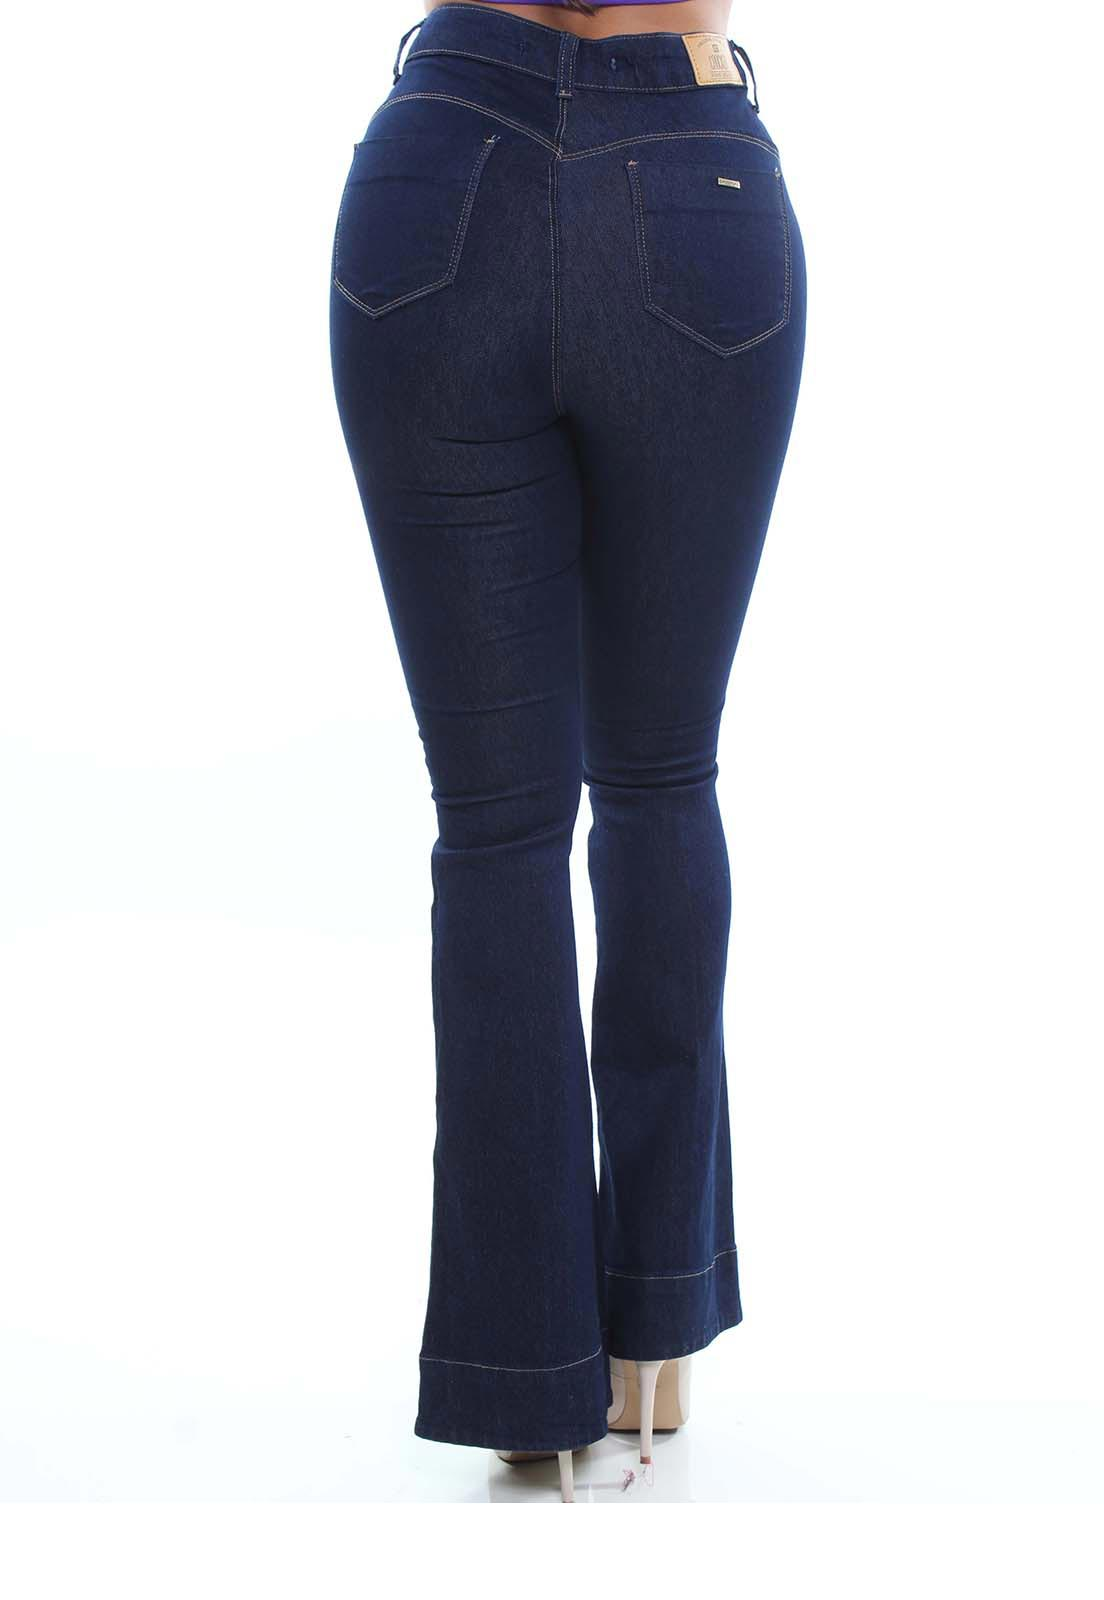 Calça Jeans Feminina Flare Crocker - 48040  - CROCKER JEANS